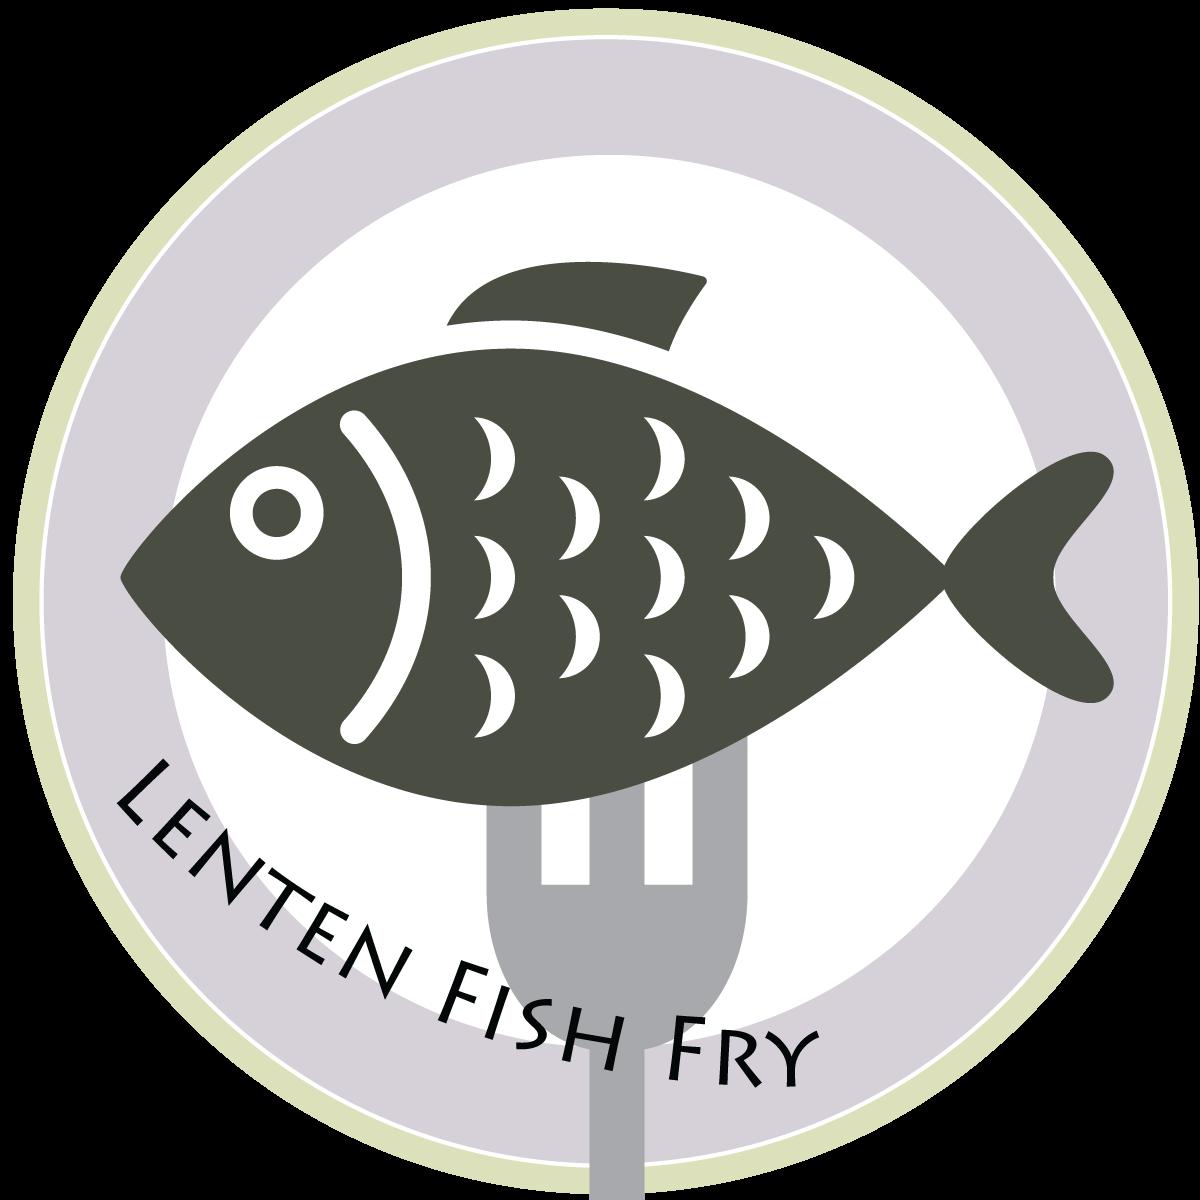 Car wash and fish fry clipart